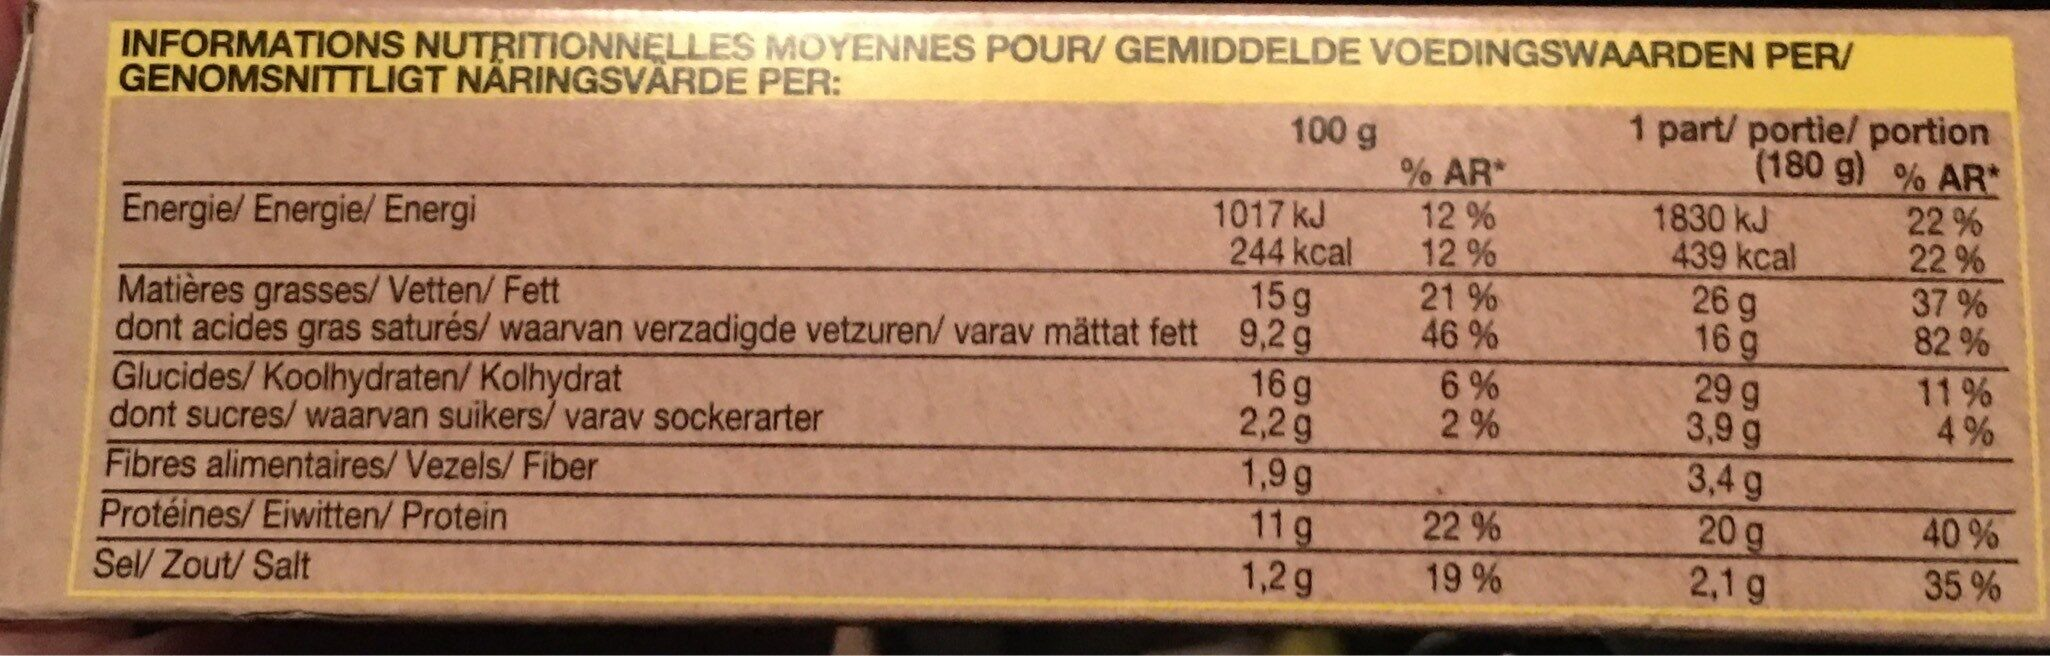 Tartine a la montagnarde - Voedingswaarden - fr